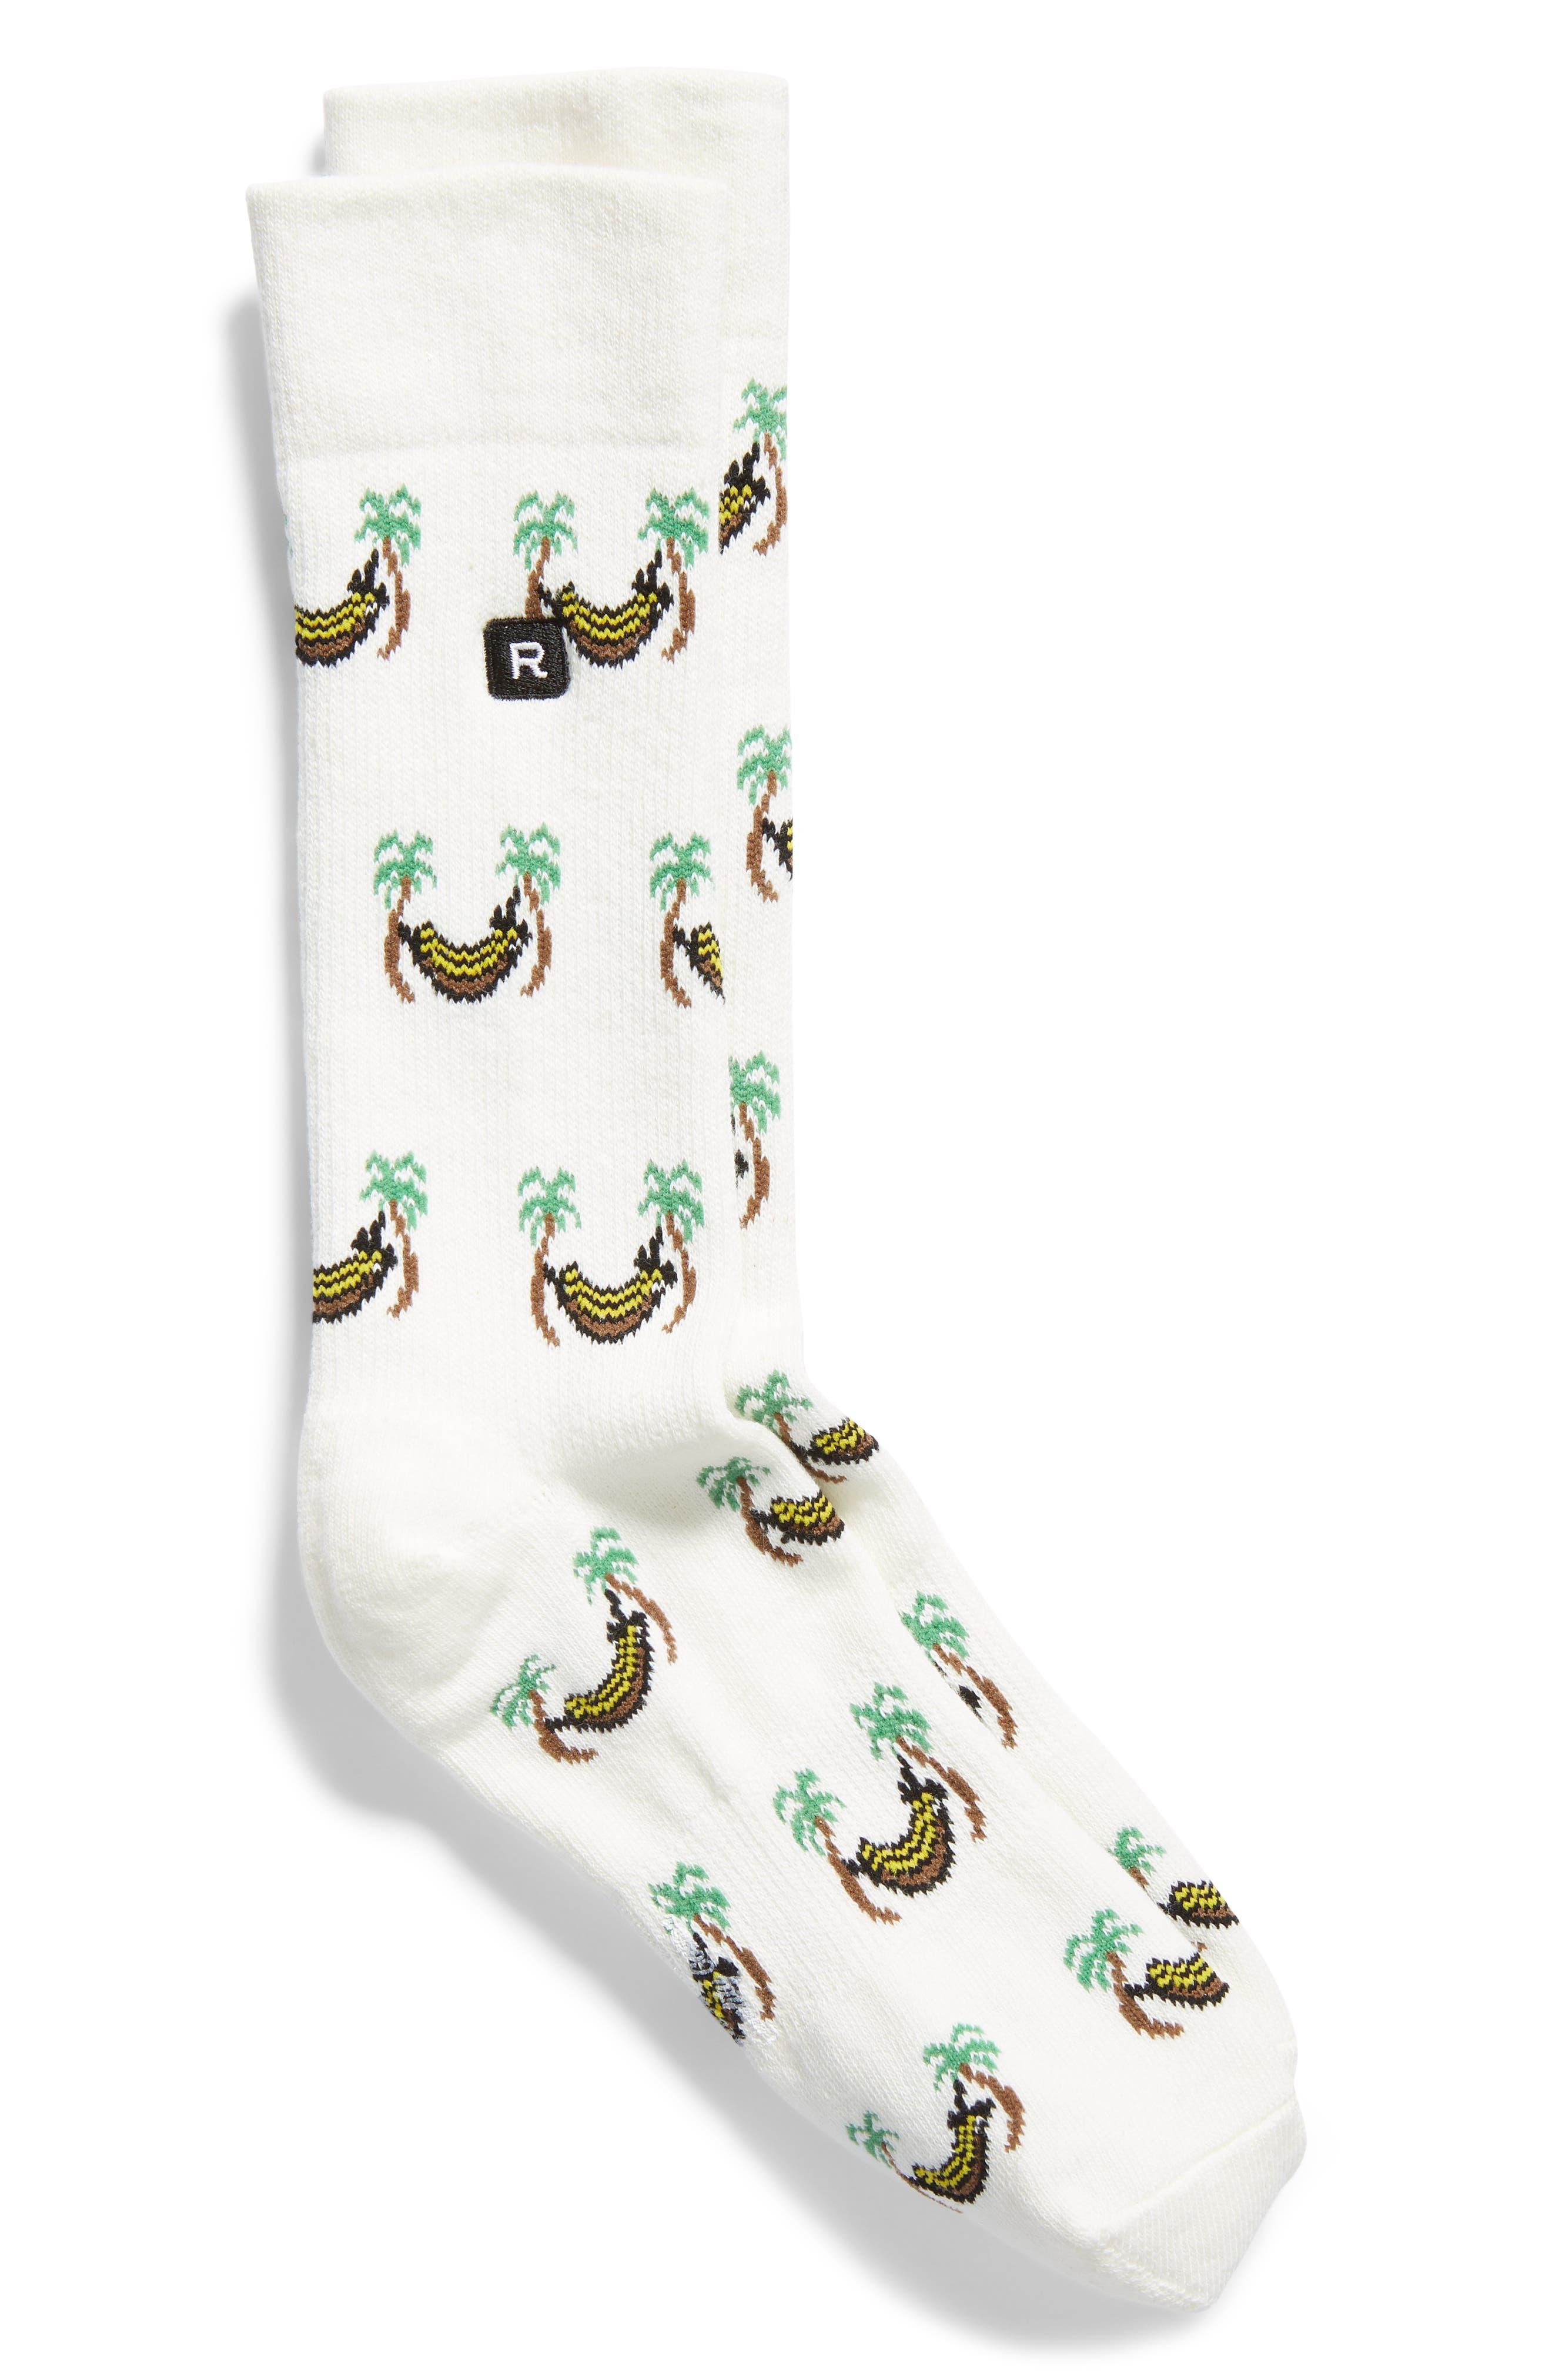 RICHER POORER Hammock Everyday Crew Socks in Ivory